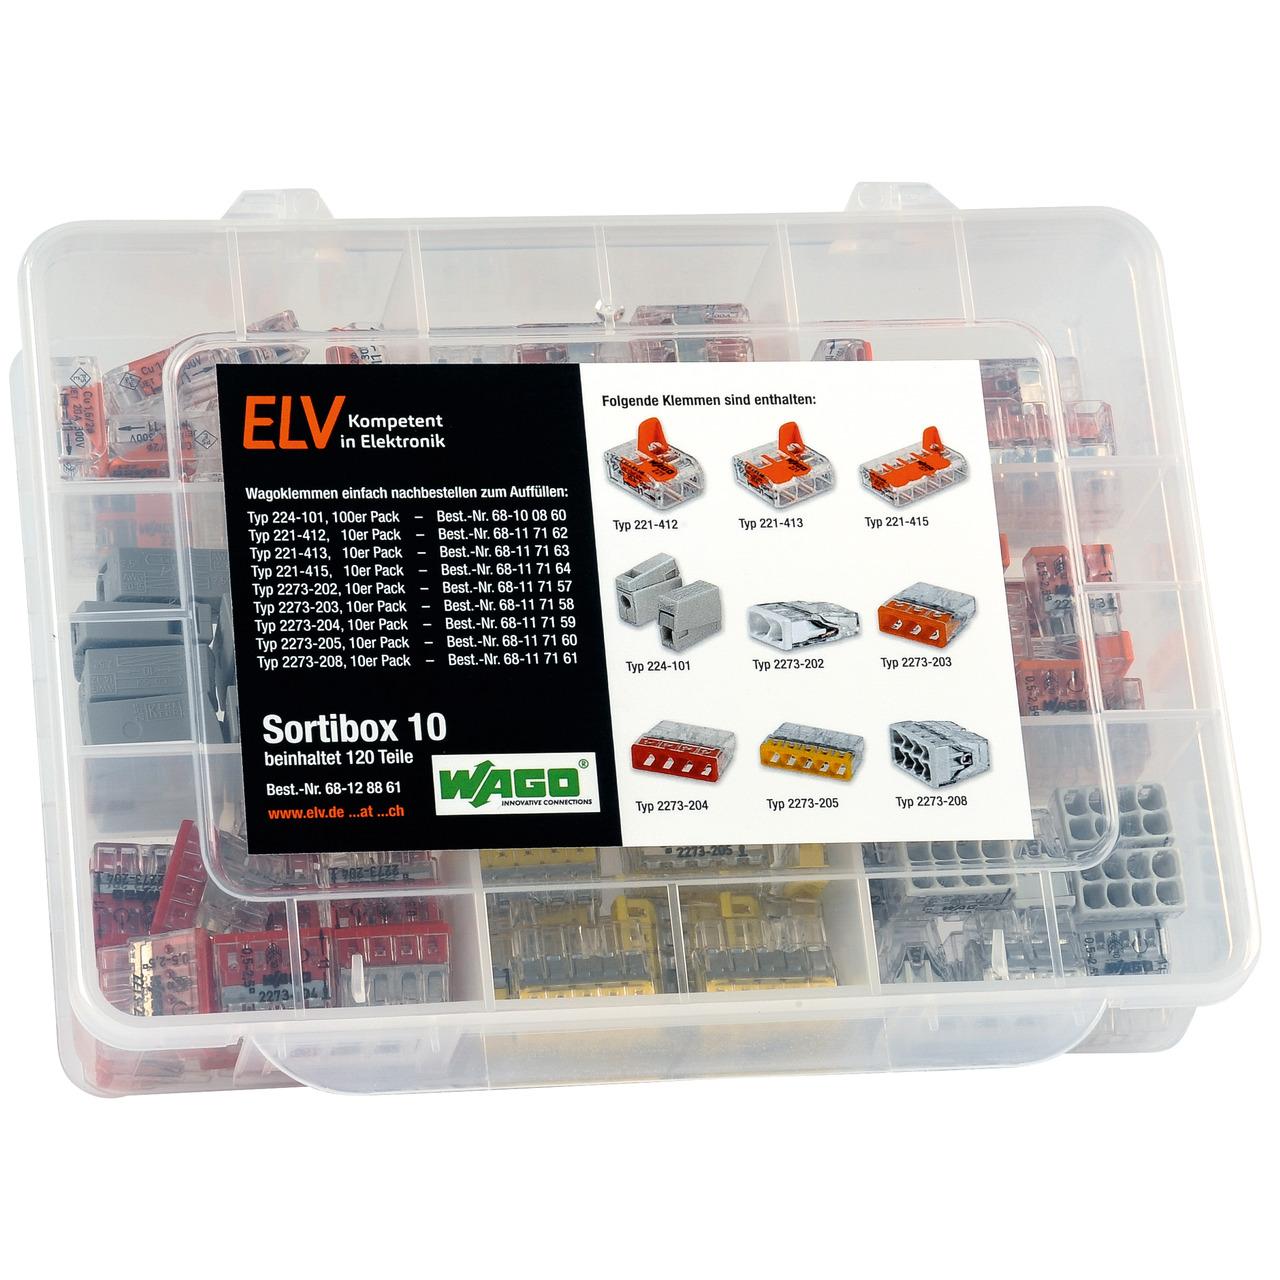 ELV Wago-Sortimentsbox Nr- 10 mit 120 Wago-Klemmen